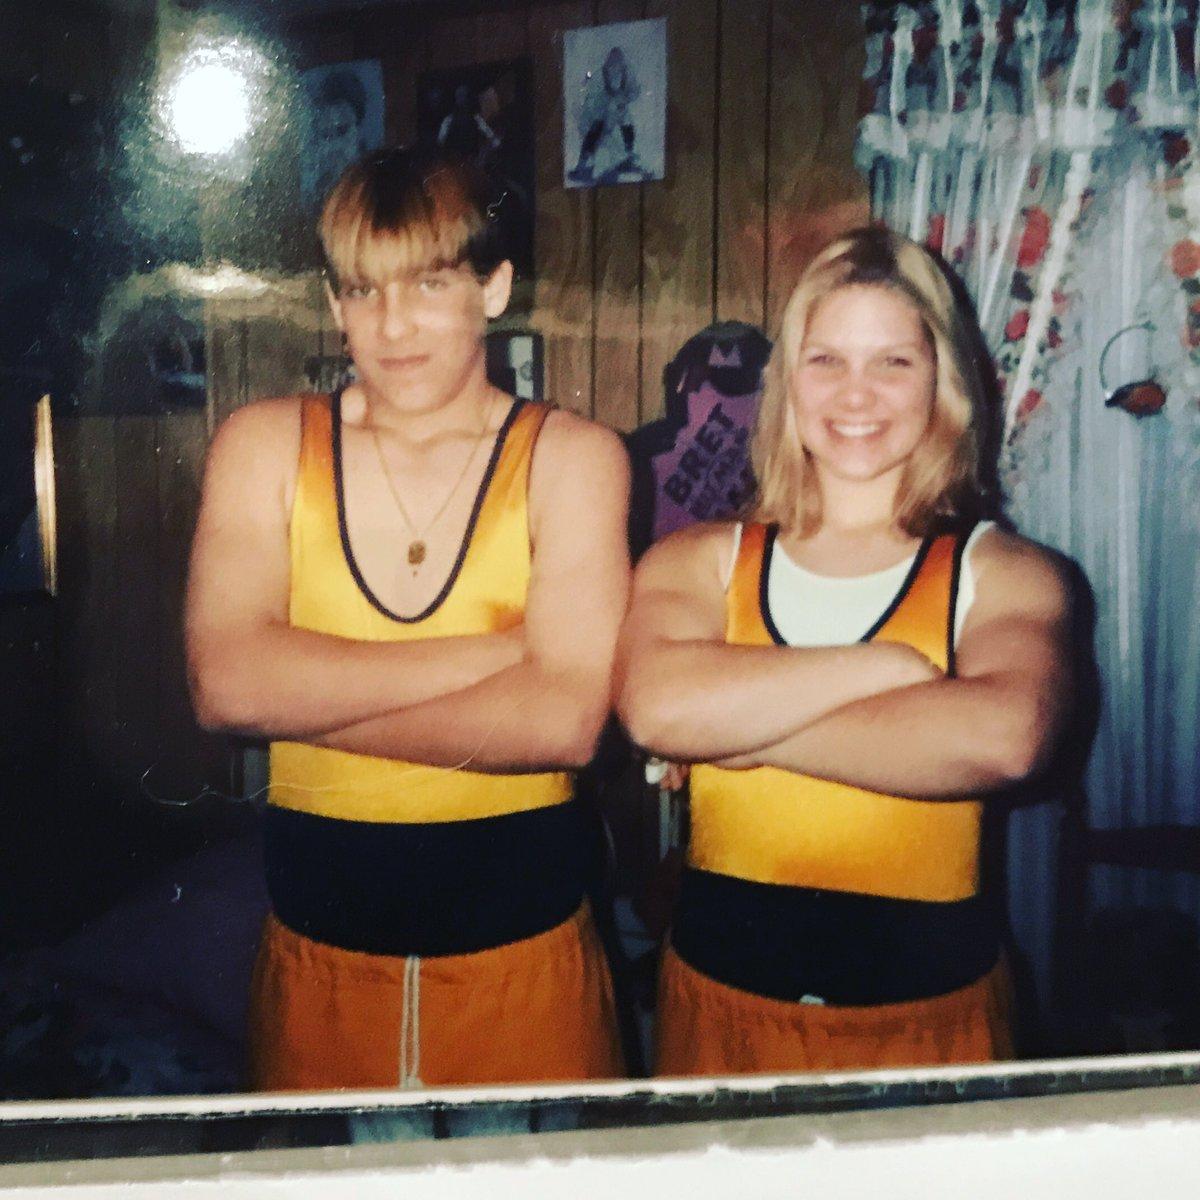 Kocianski Siblings ready to rumble #ElmiraNotreDame #1998 #TwentyYearsAgo 🤢